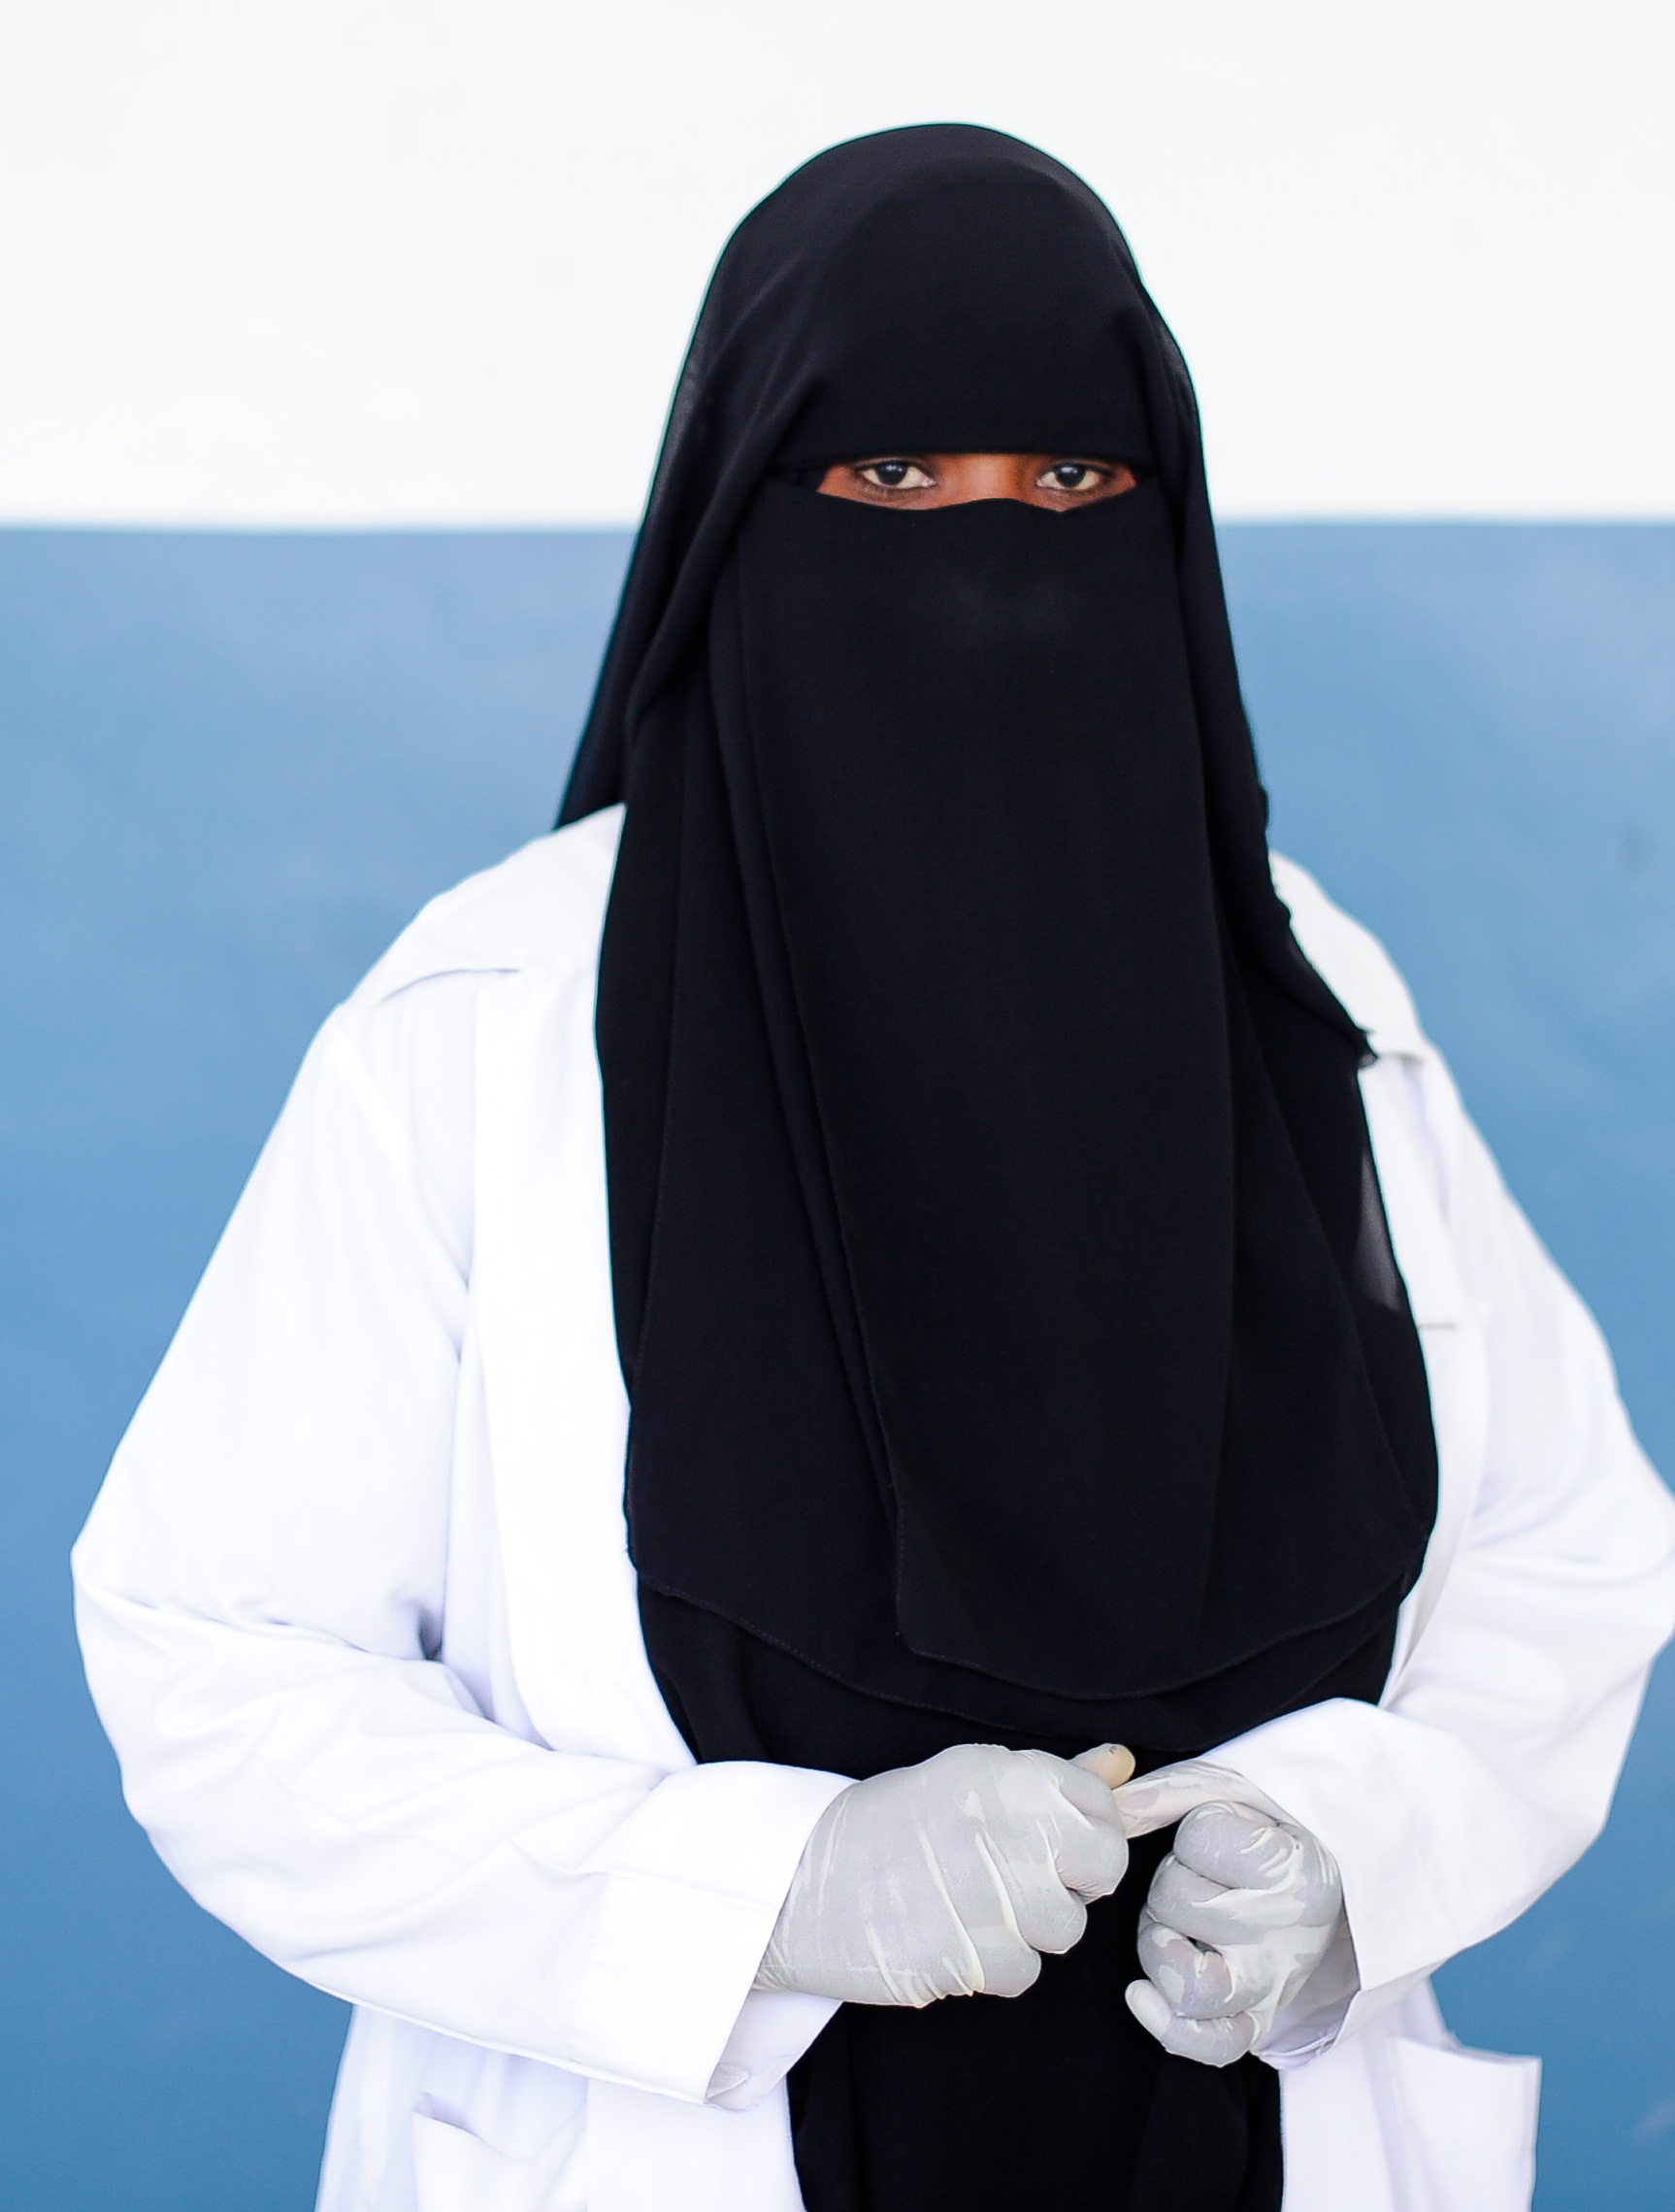 Filea Nurse Stands In Banadir Hospital On World Aids Day -6183